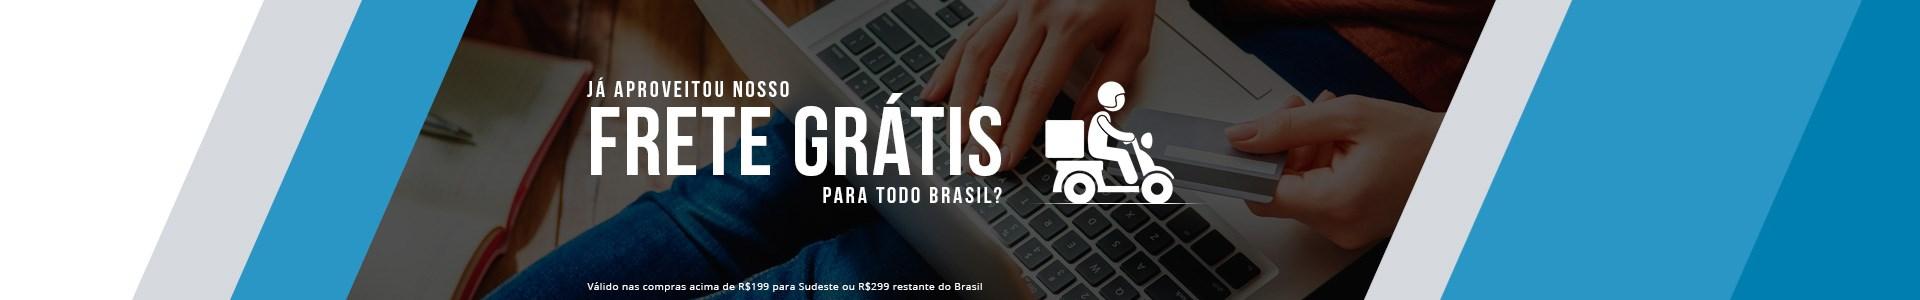 Frete Grátis para todo Brasil